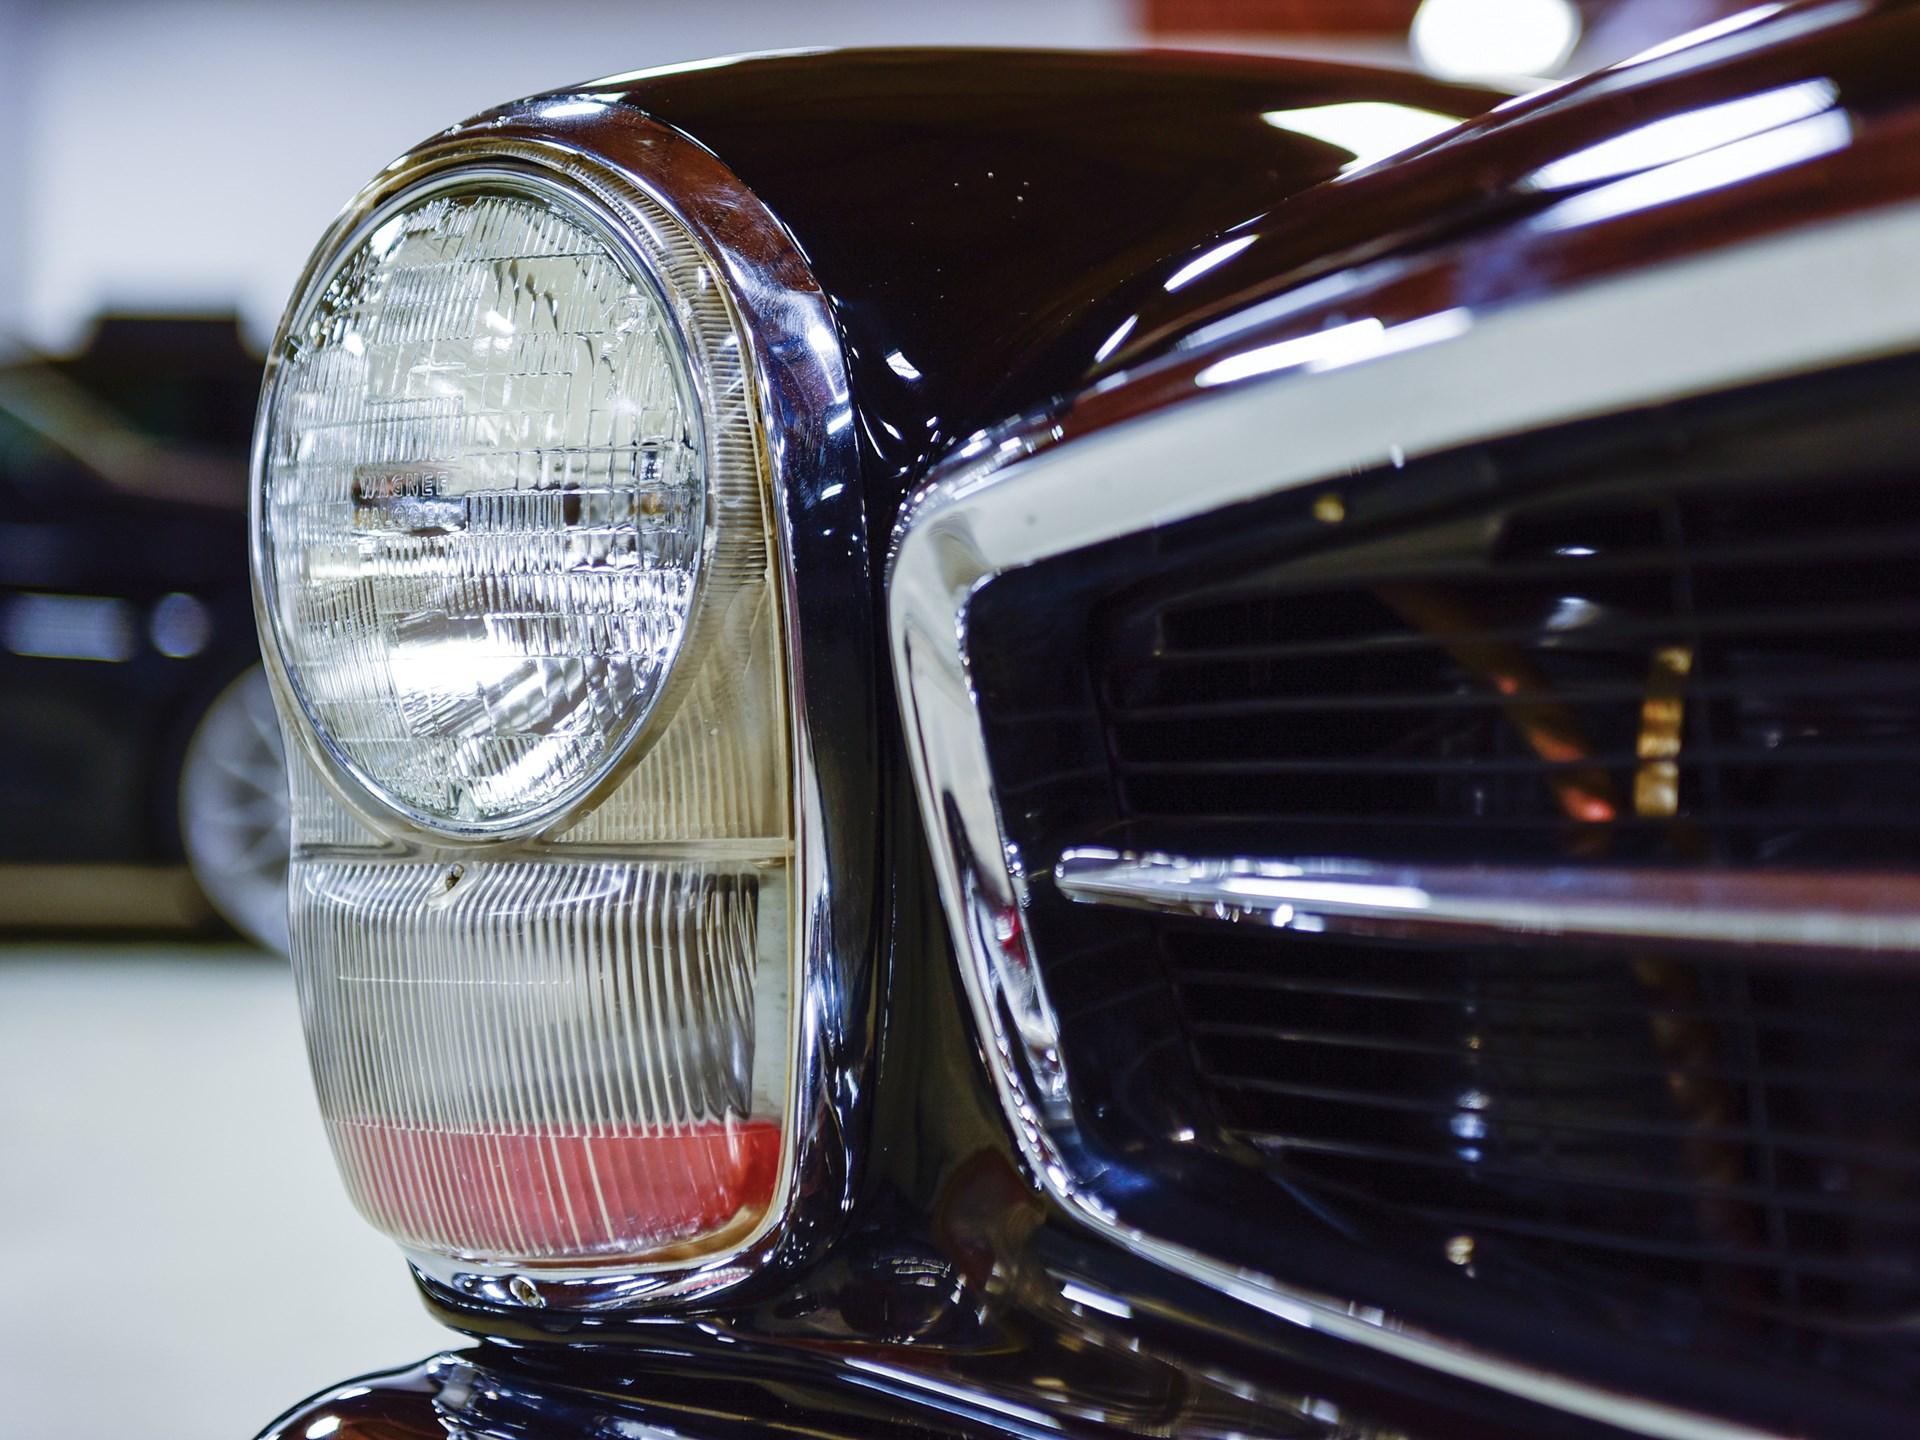 1964 Mercedes-Benz 230 SL 'Pagoda'